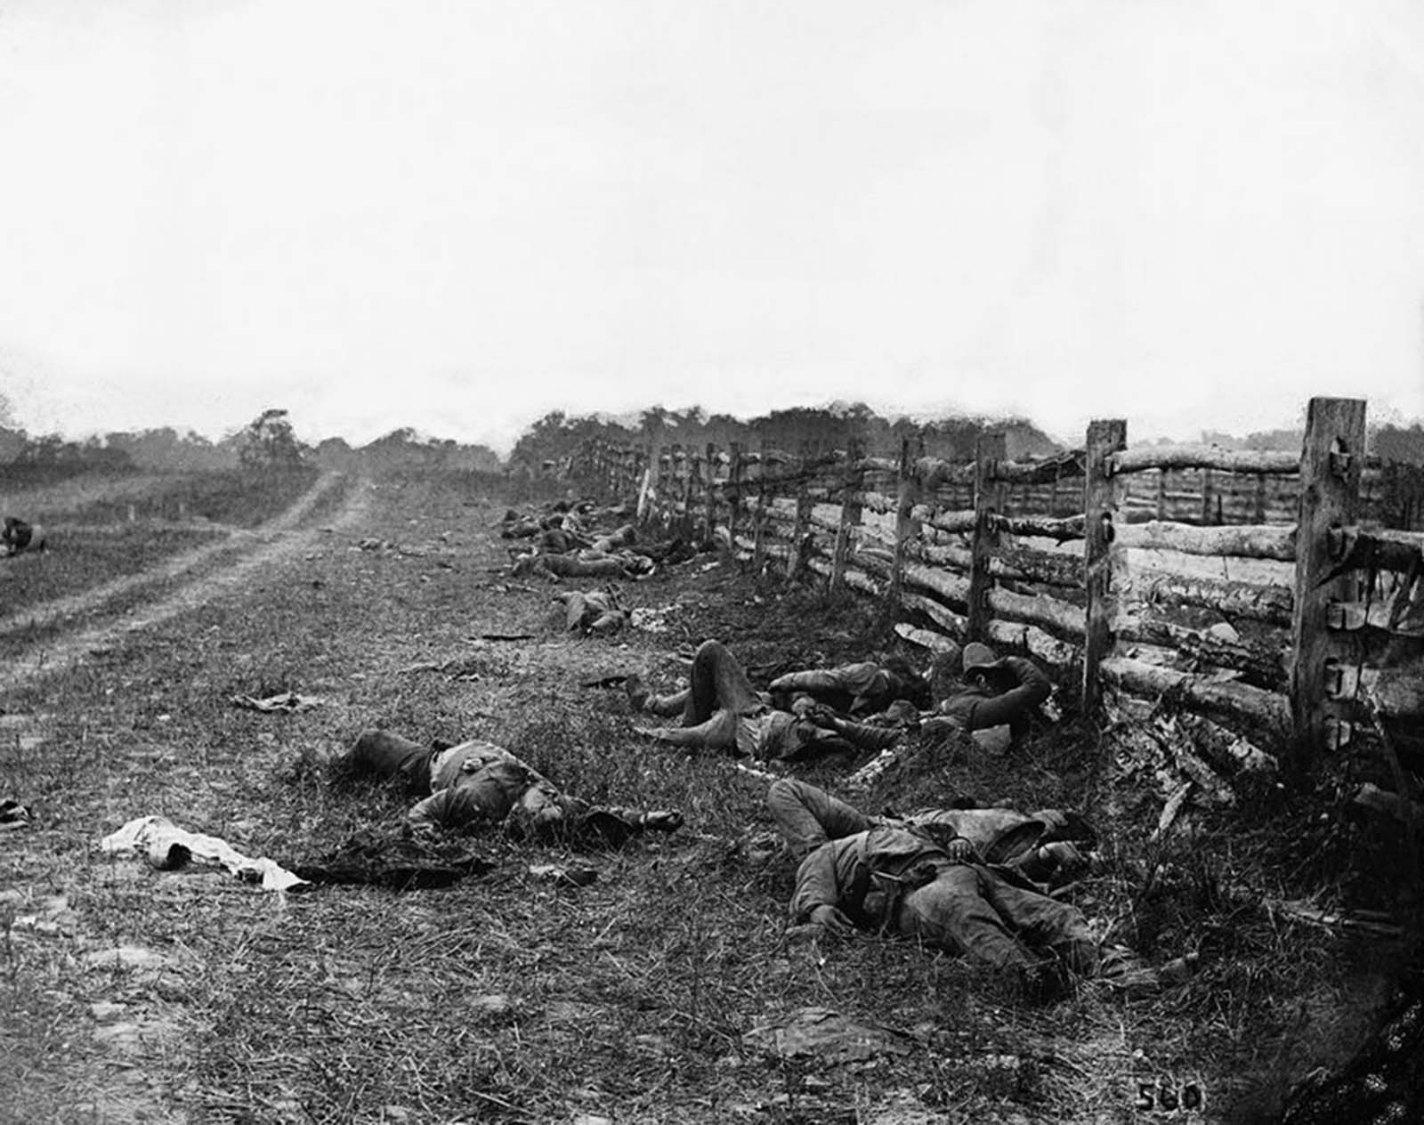 historical photos: The Dead of Antietam, Alexander Gardner, 1862